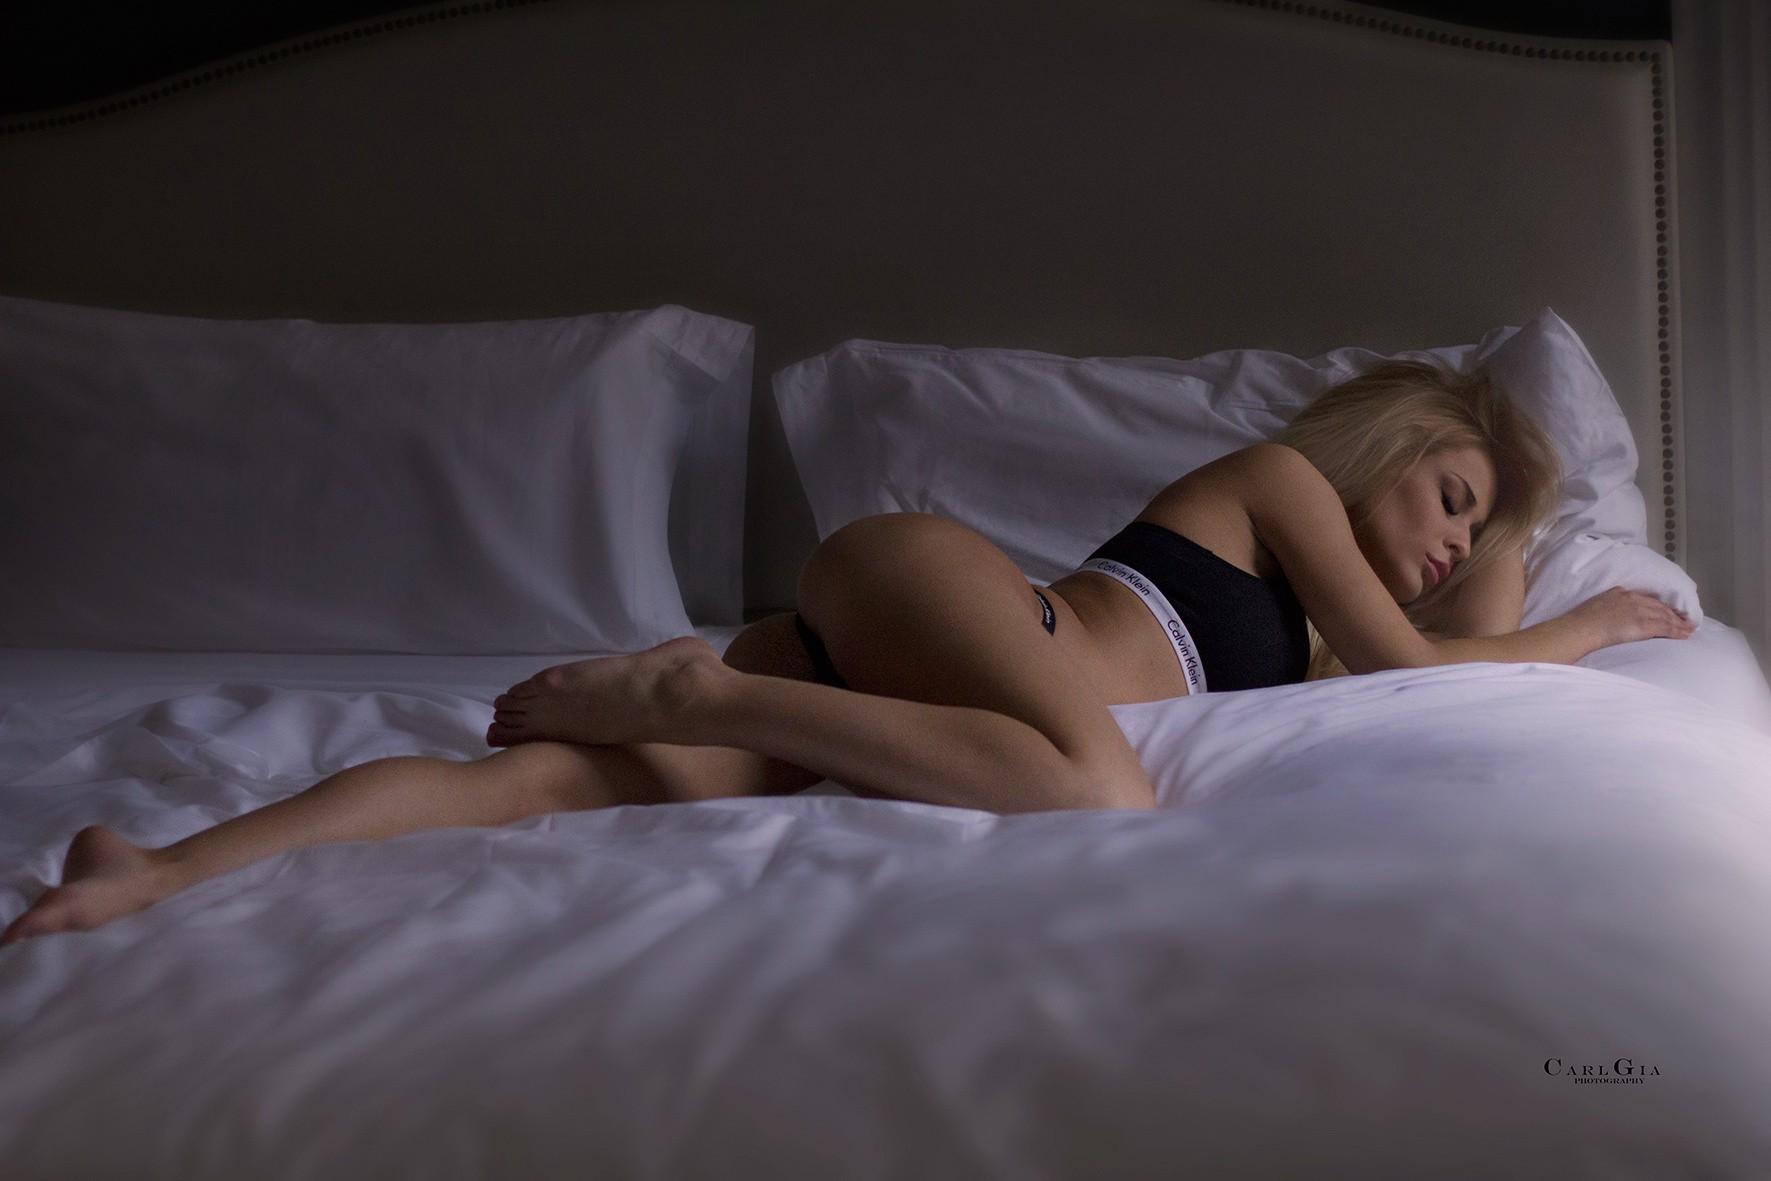 Обнаженная Женщина Во Сне